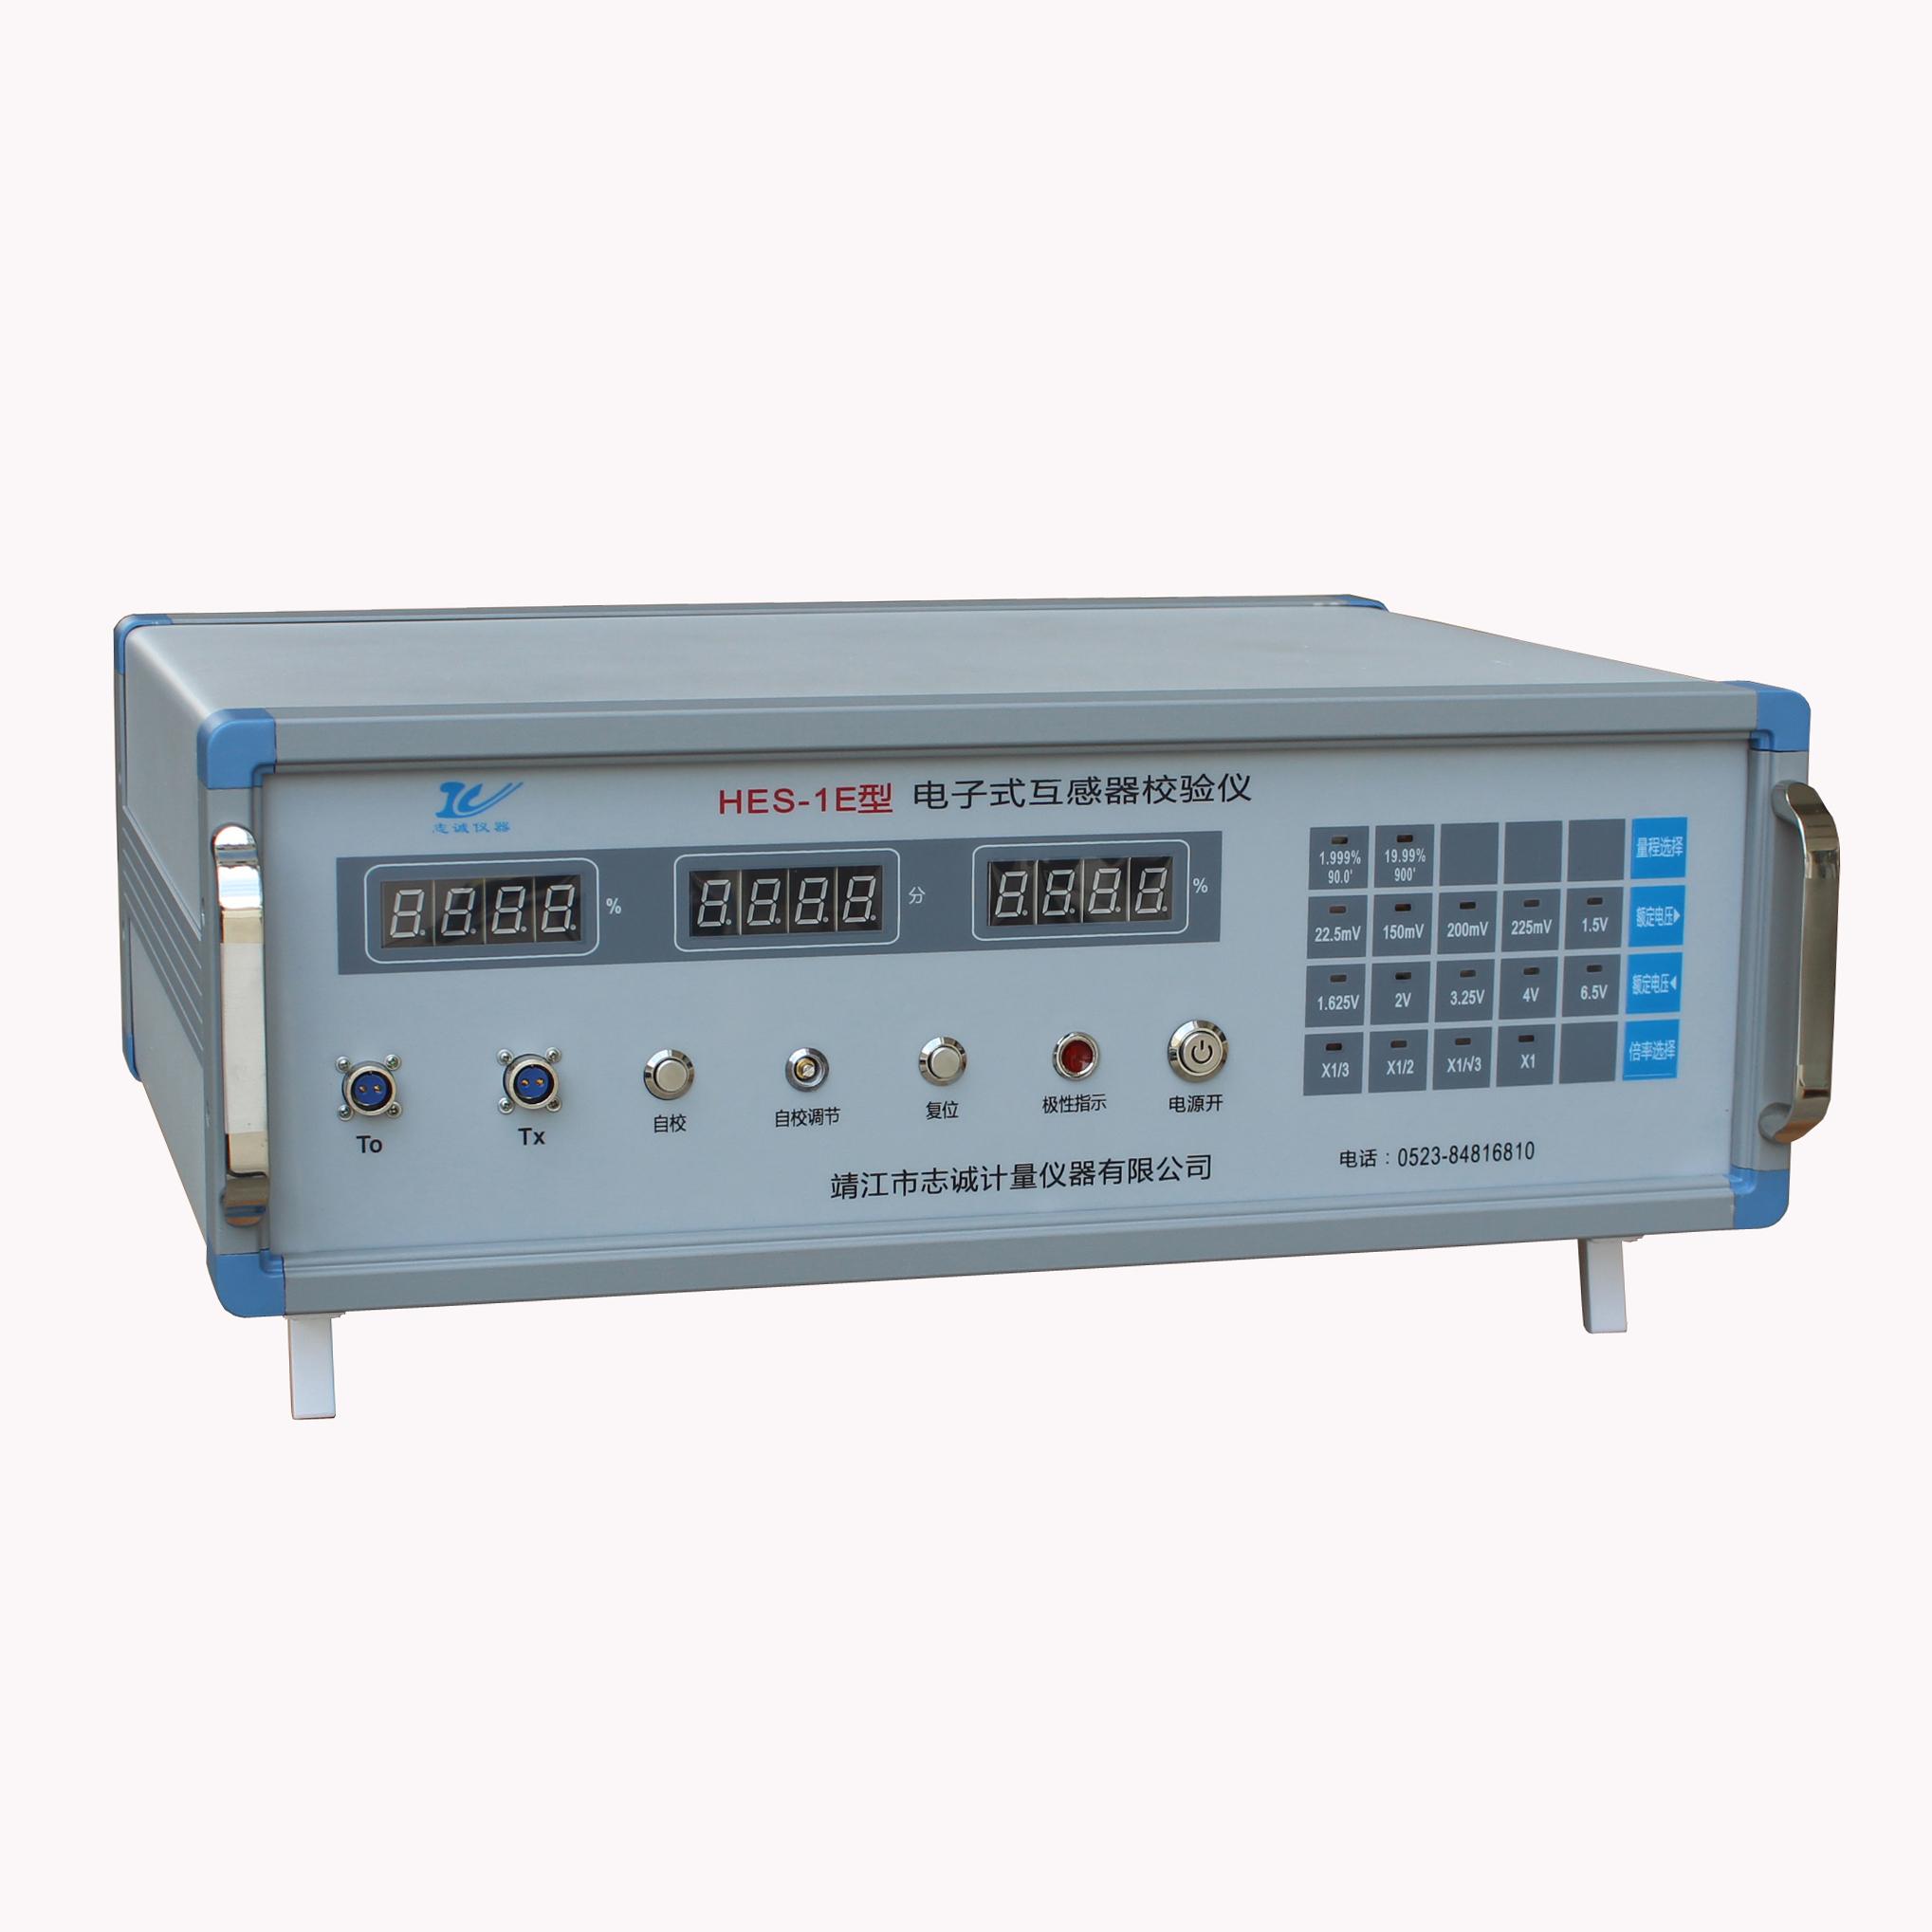 HES-1E型电子式互感器校验仪